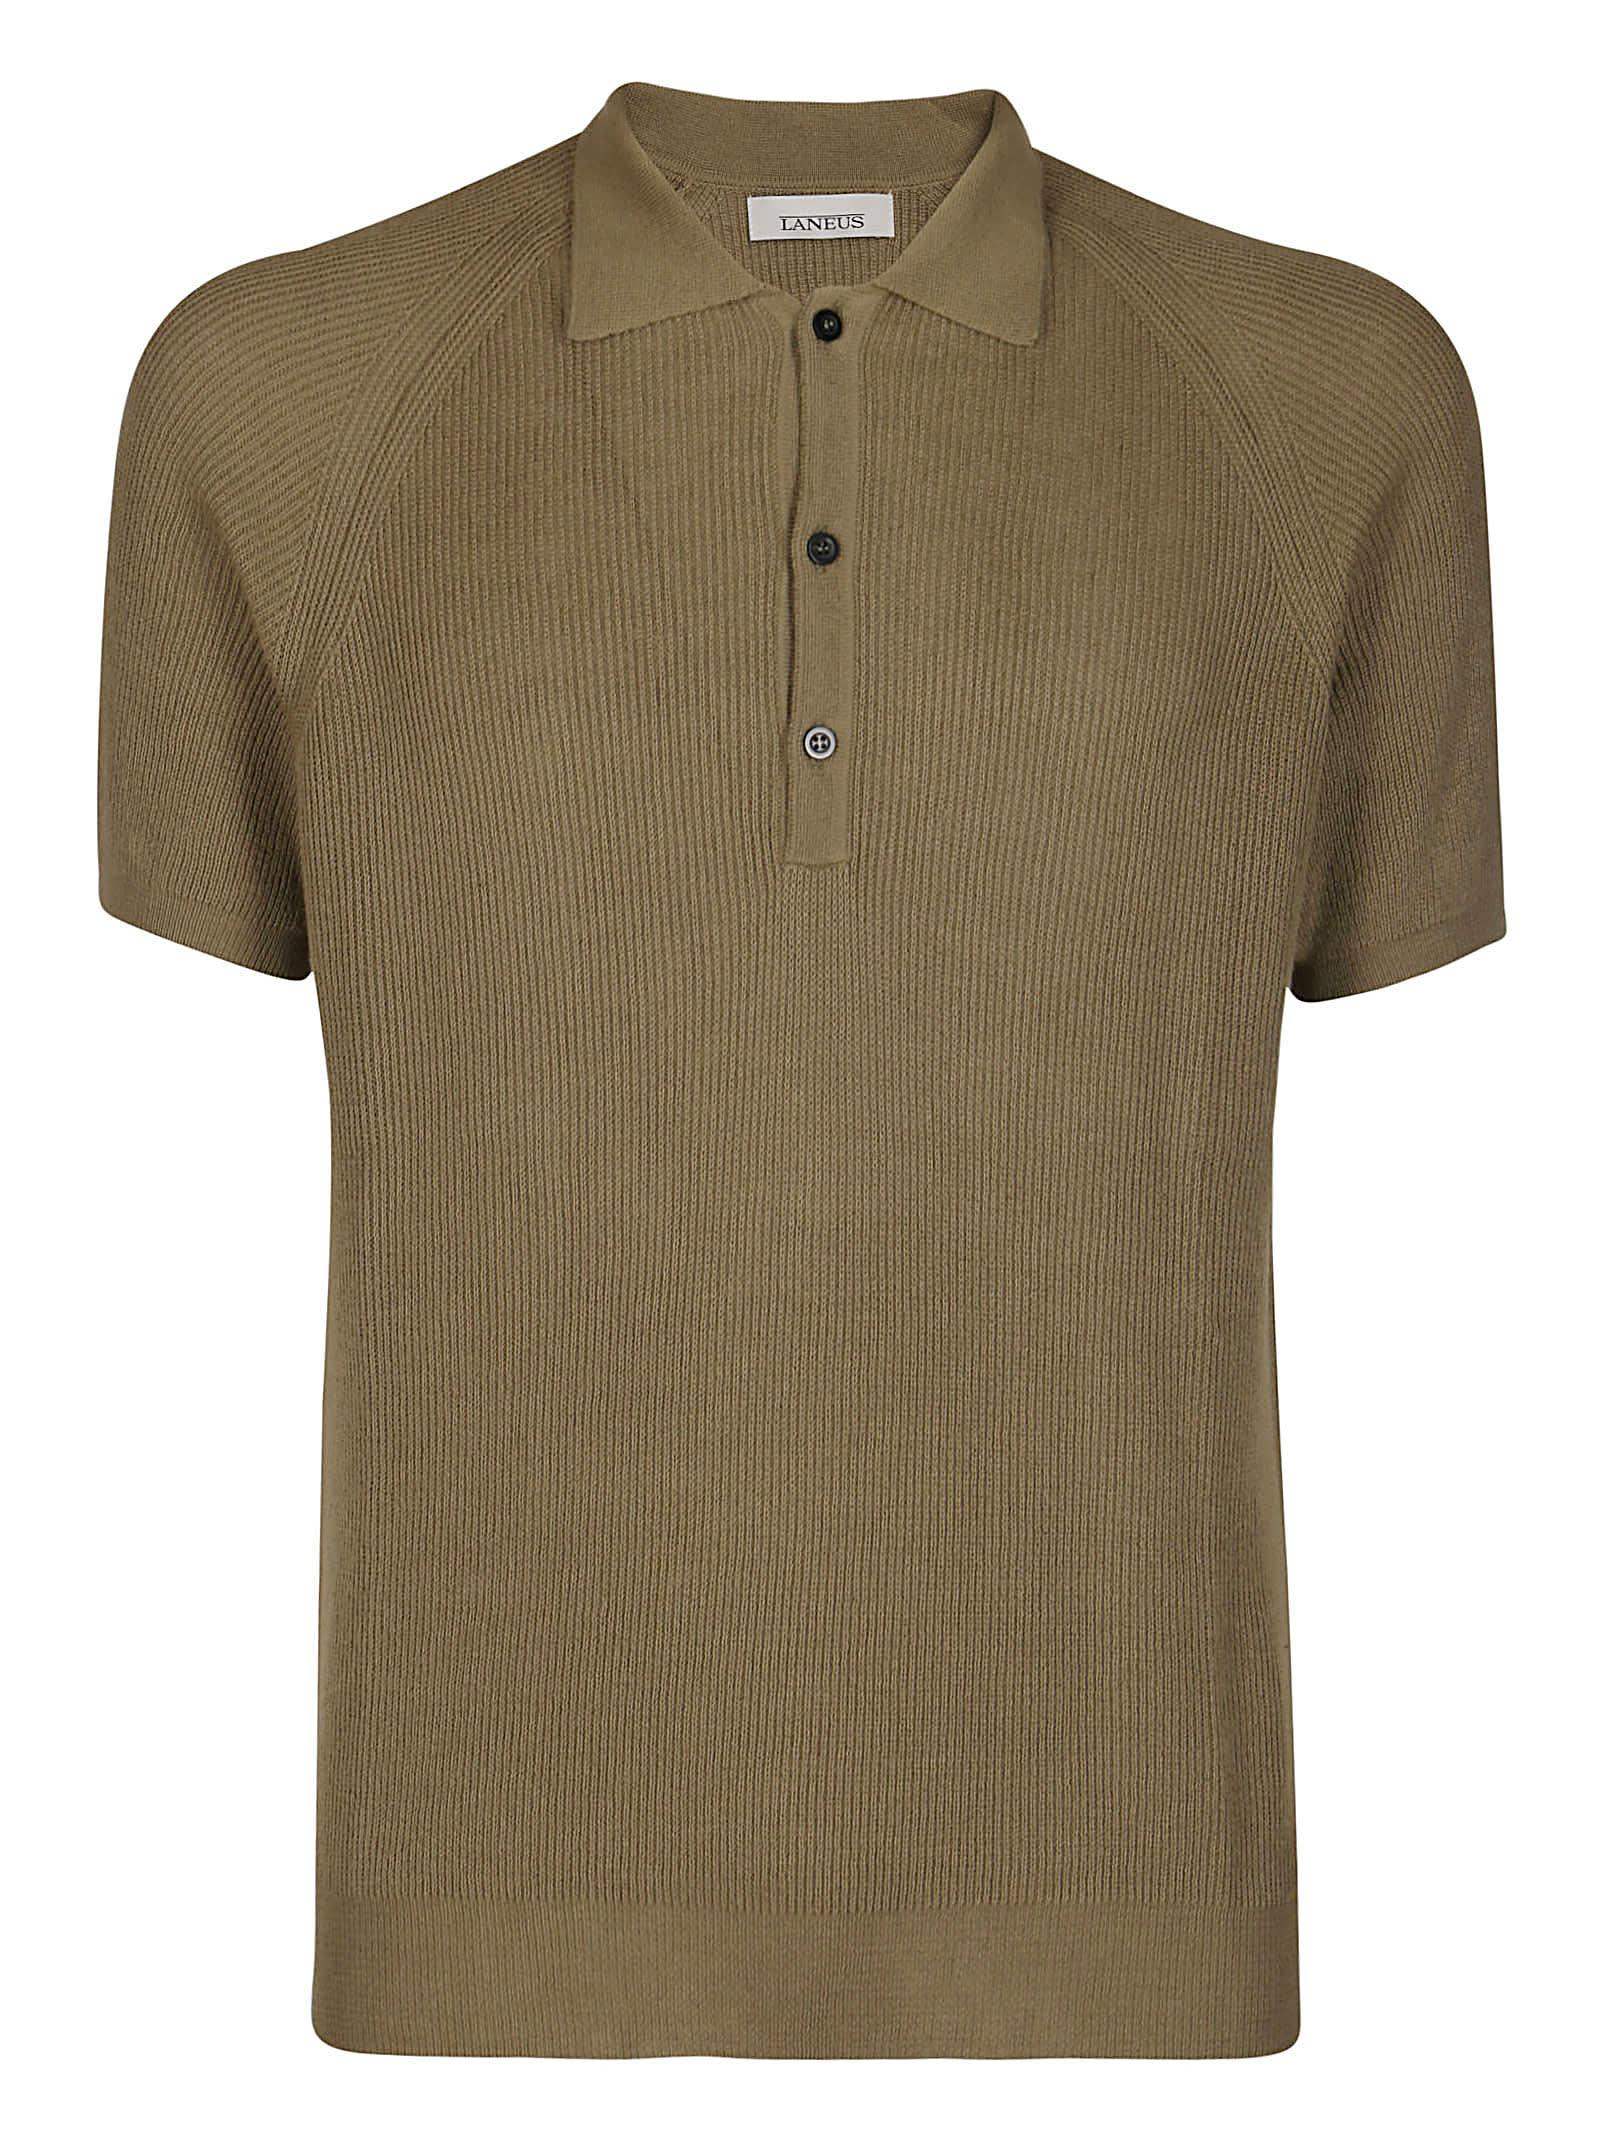 Laneus Cottons ARMY GREEN COTTON POLO SHIRT